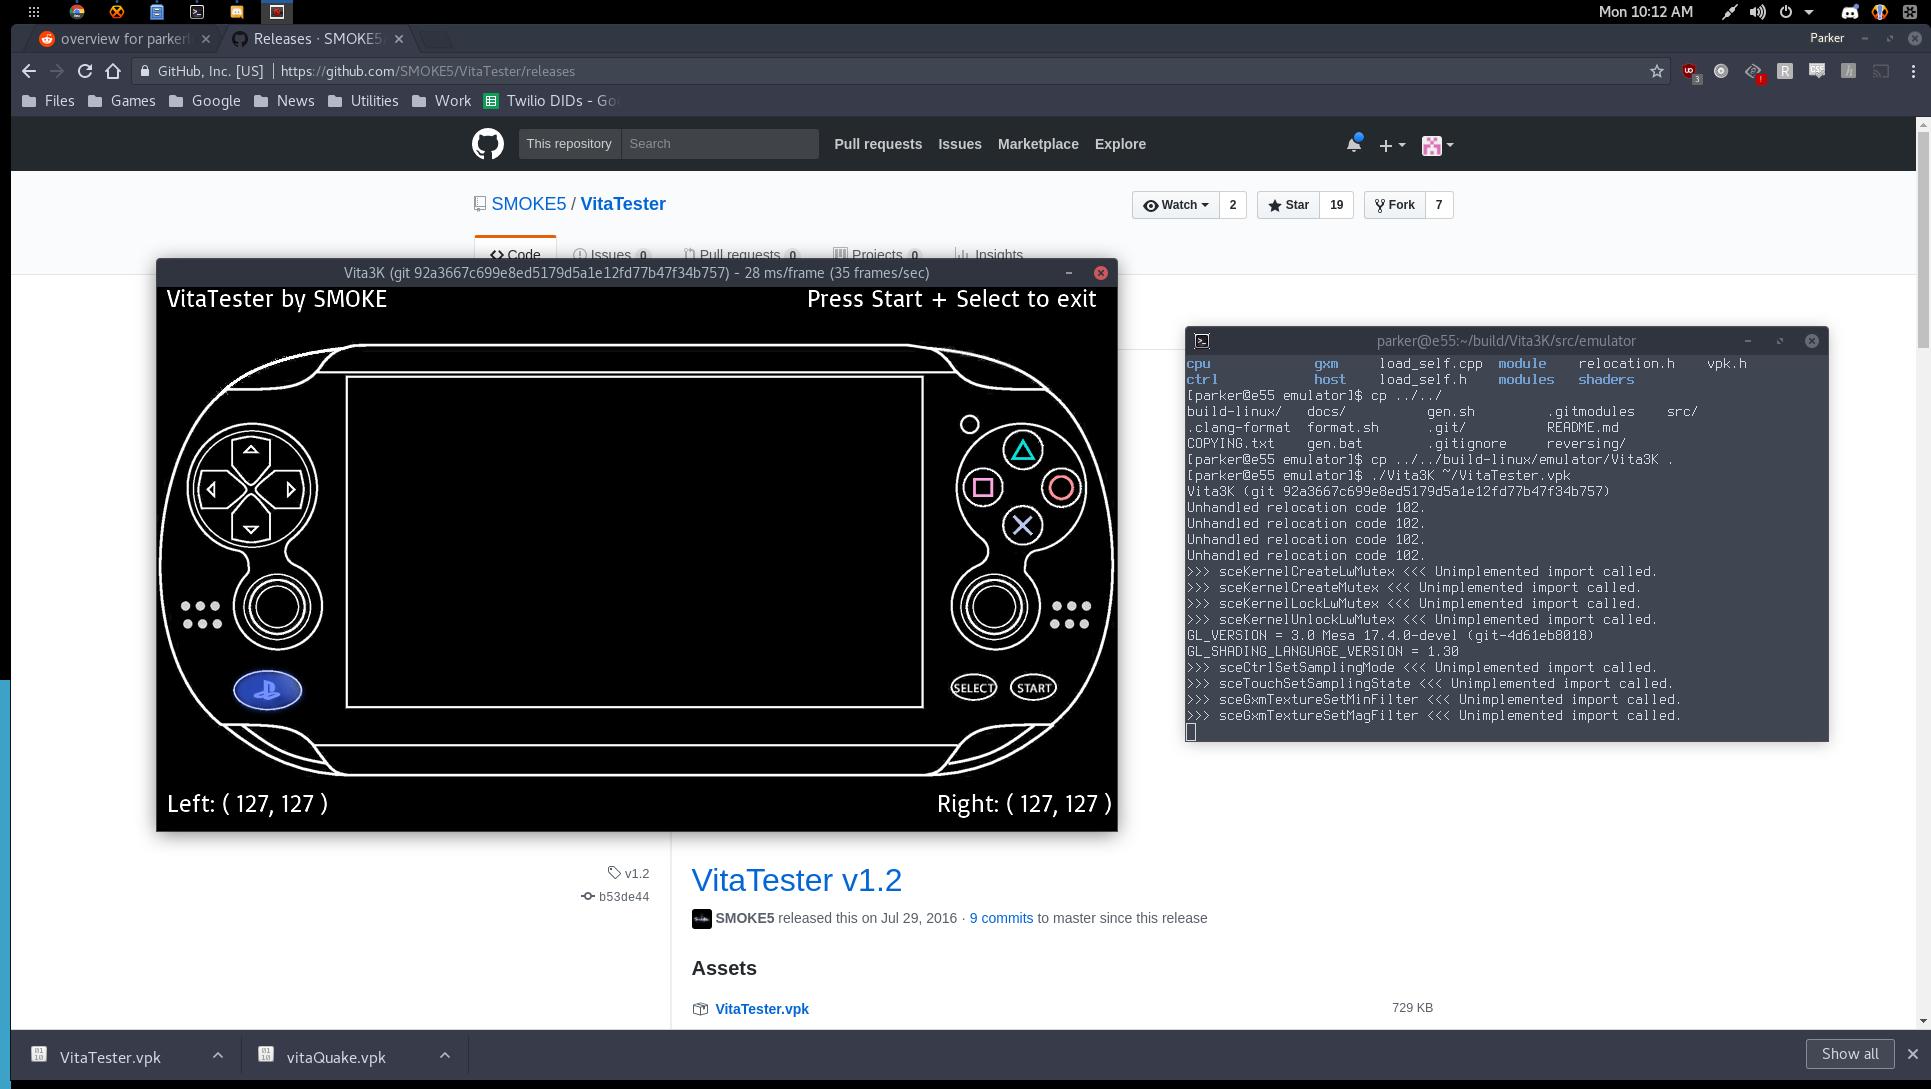 Linux build fails on the final linking · Issue #9 · Vita3K/Vita3K